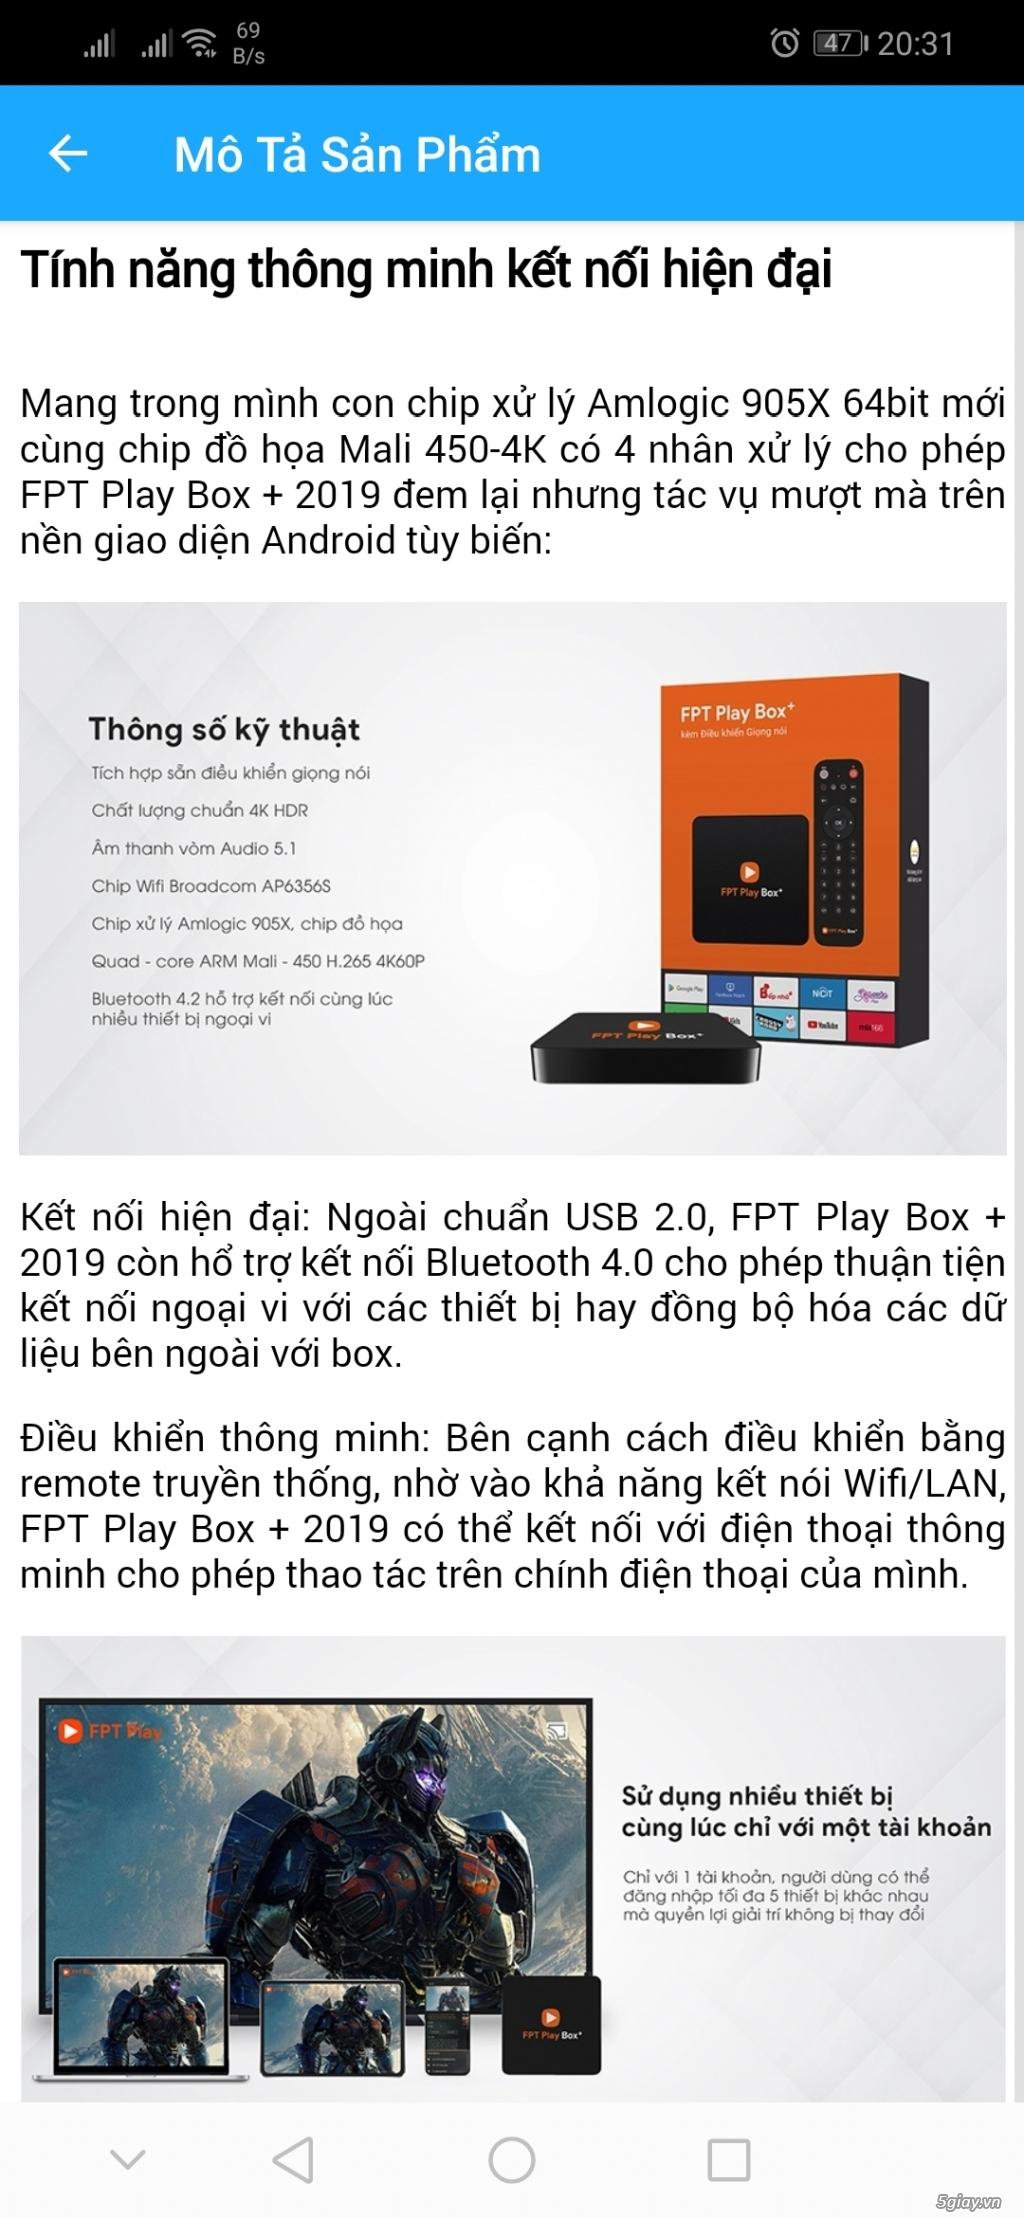 FPT PLAY BOX 2019 FULL 4K